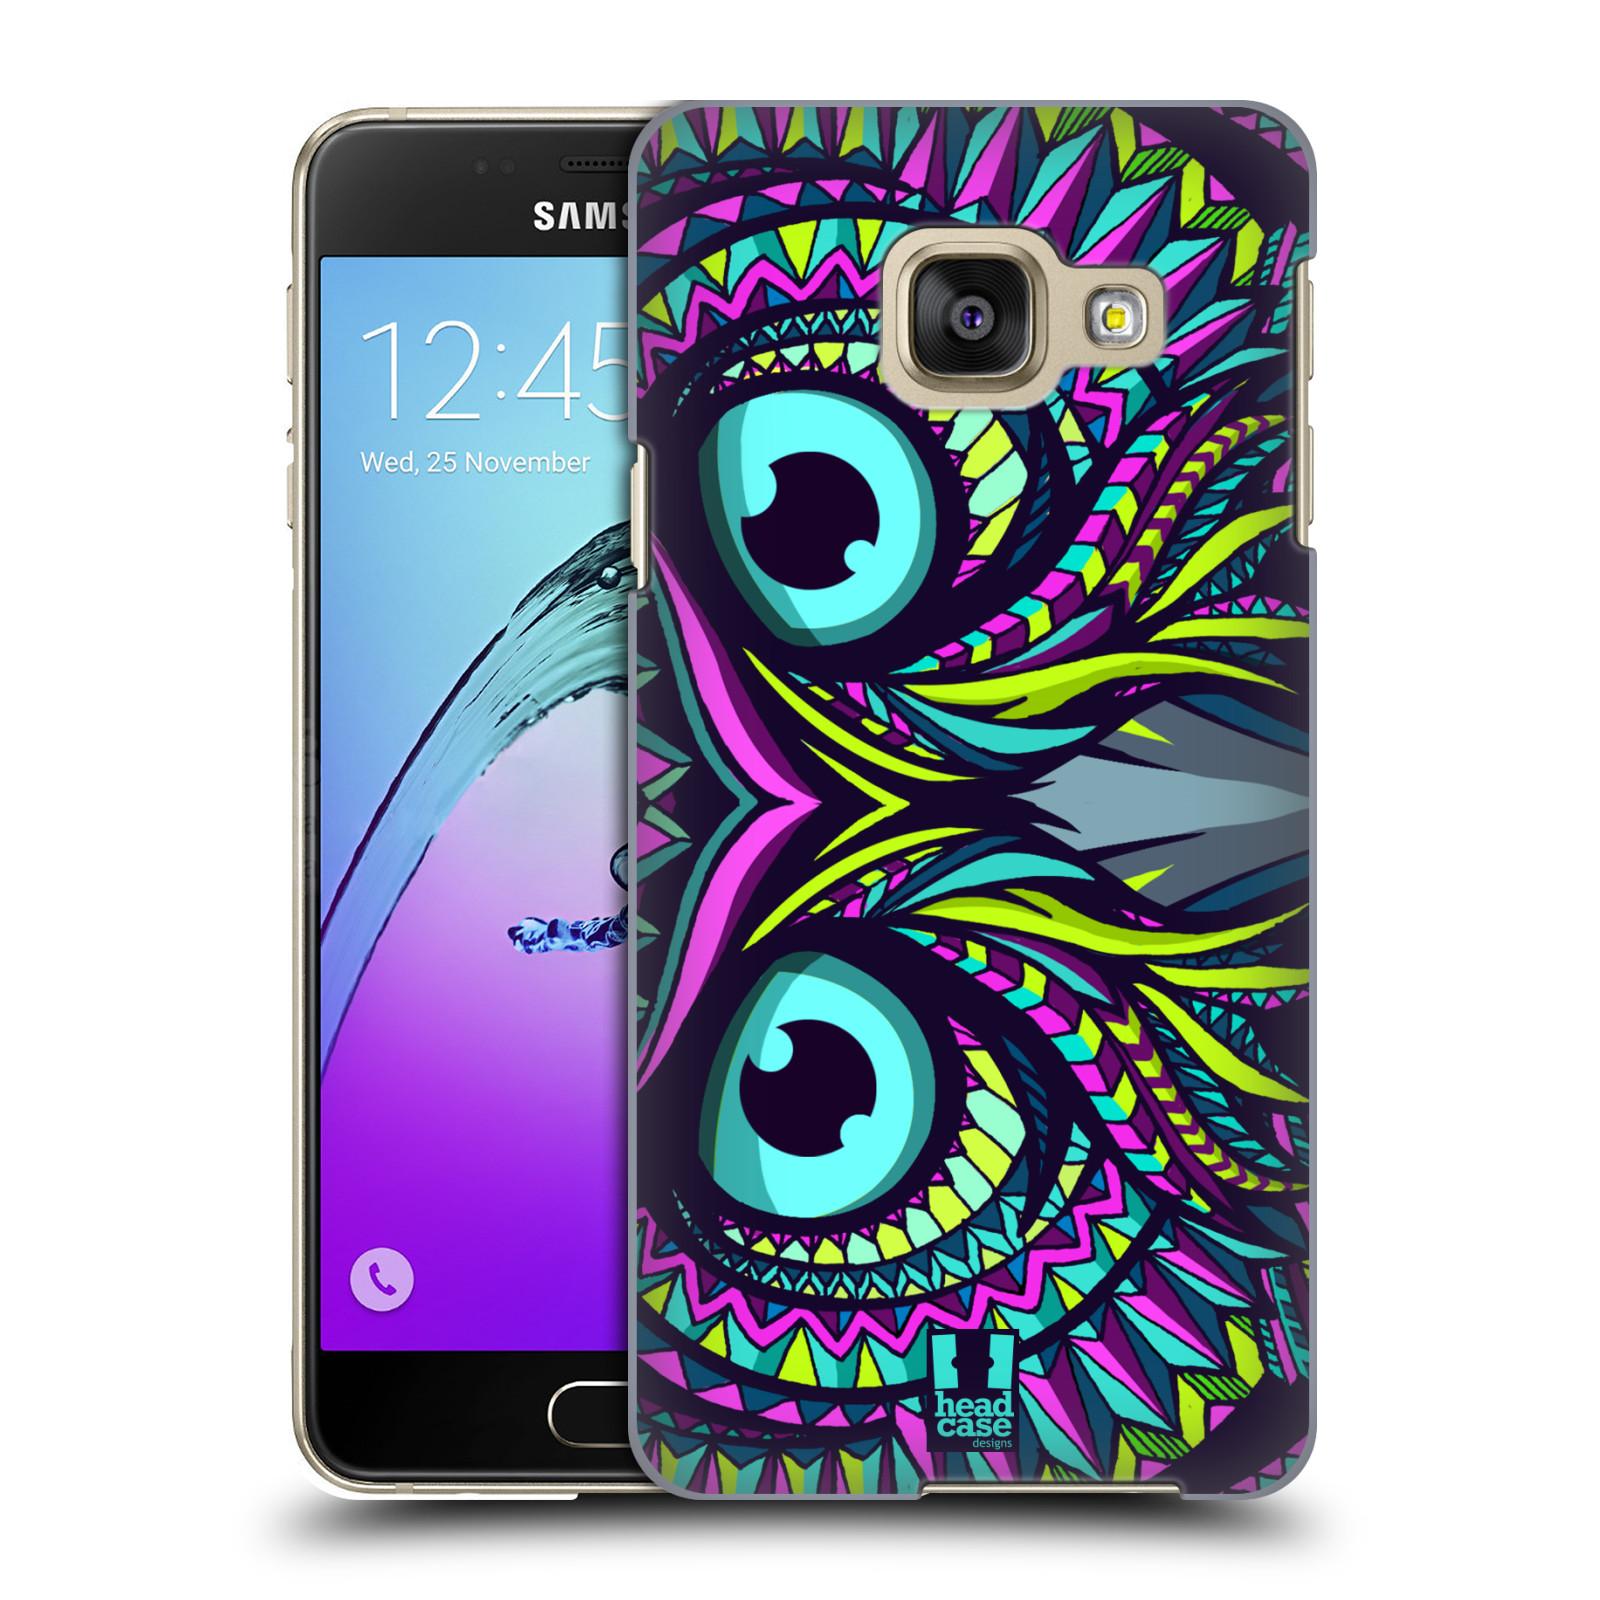 Plastové pouzdro na mobil Samsung Galaxy A3 (2016) HEAD CASE AZTEC SOVA